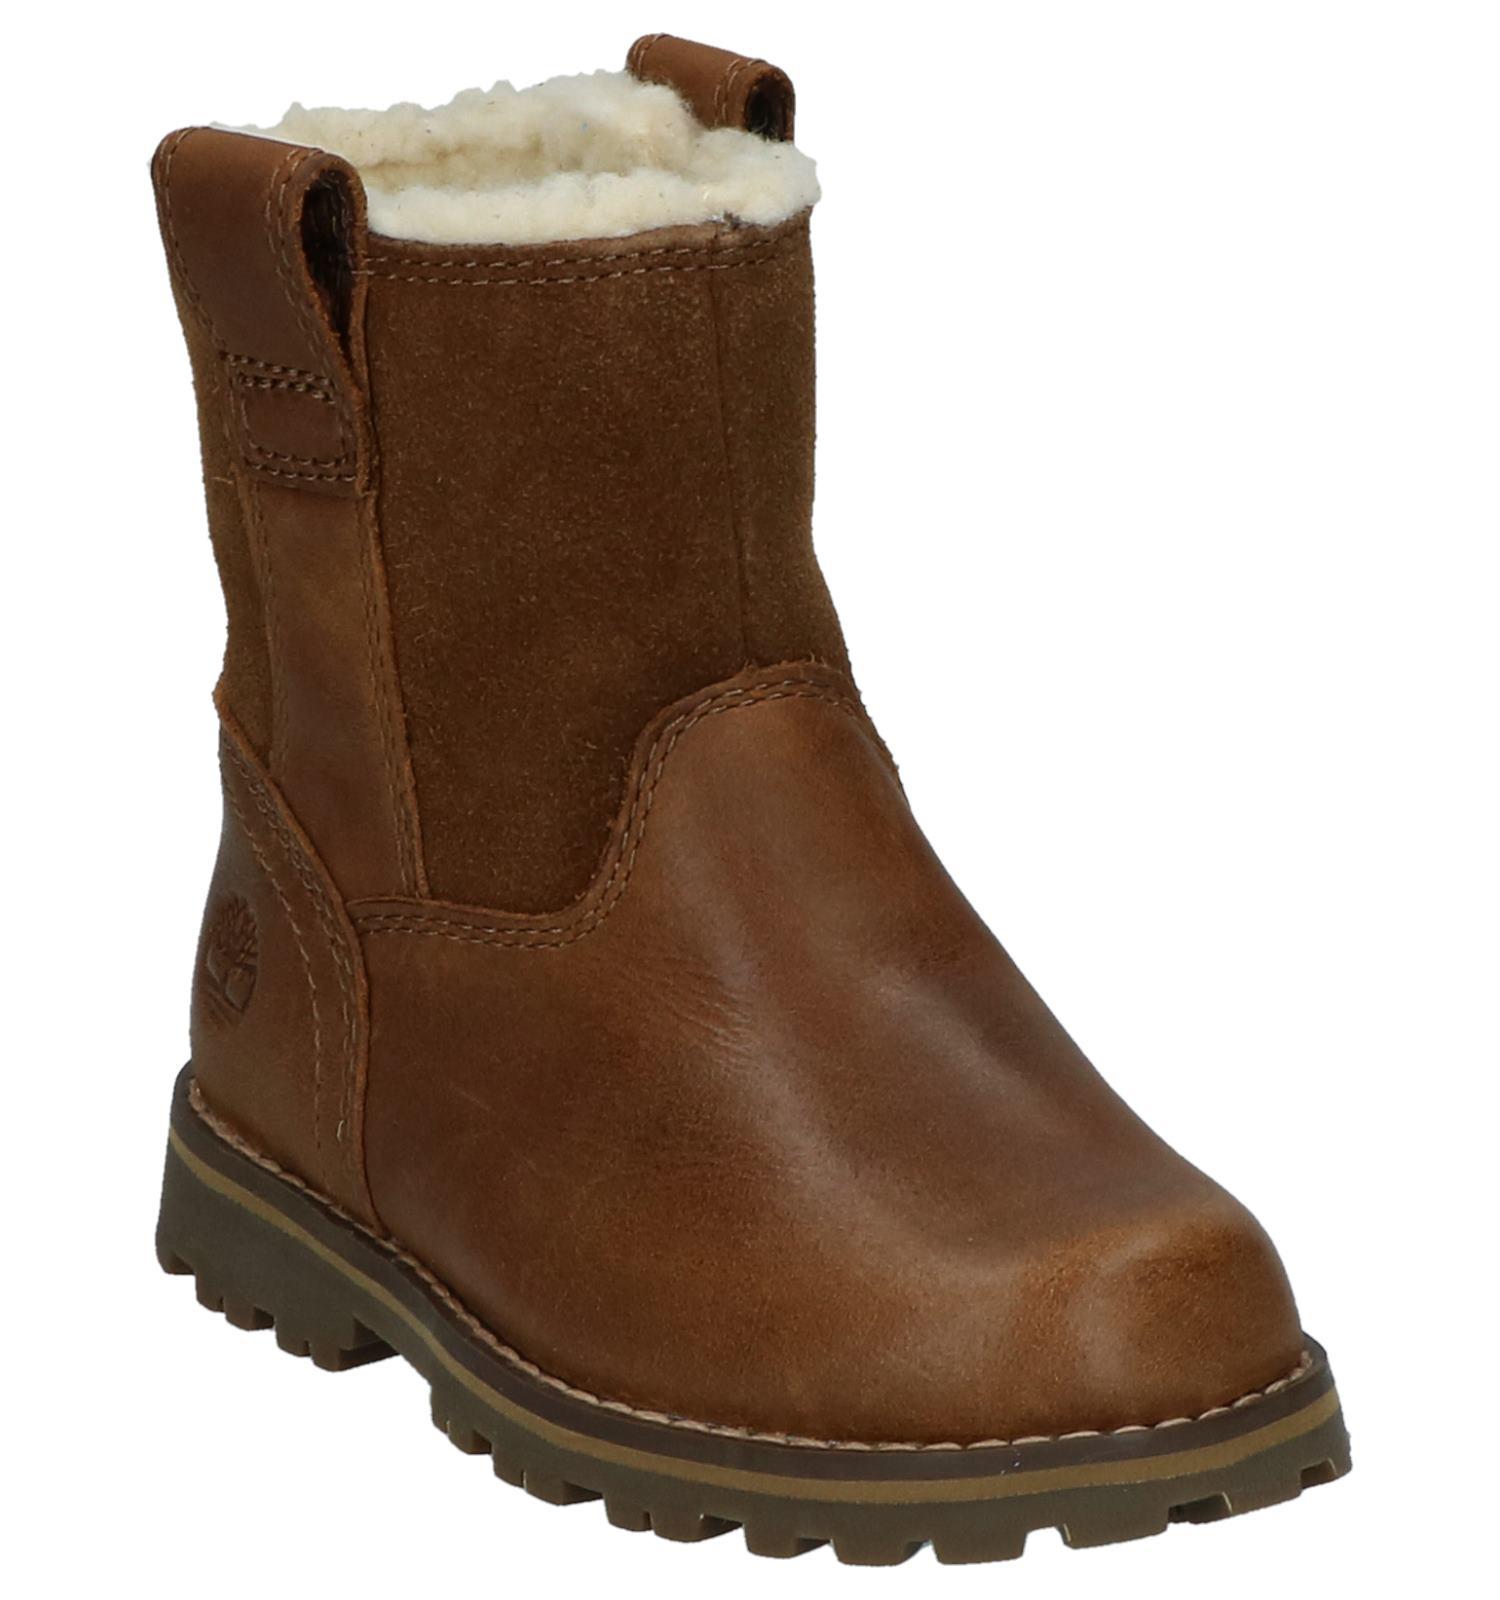 Trail Asphalt Gratis Boots Bruine Timberland Donker Torfs be wAHqq8